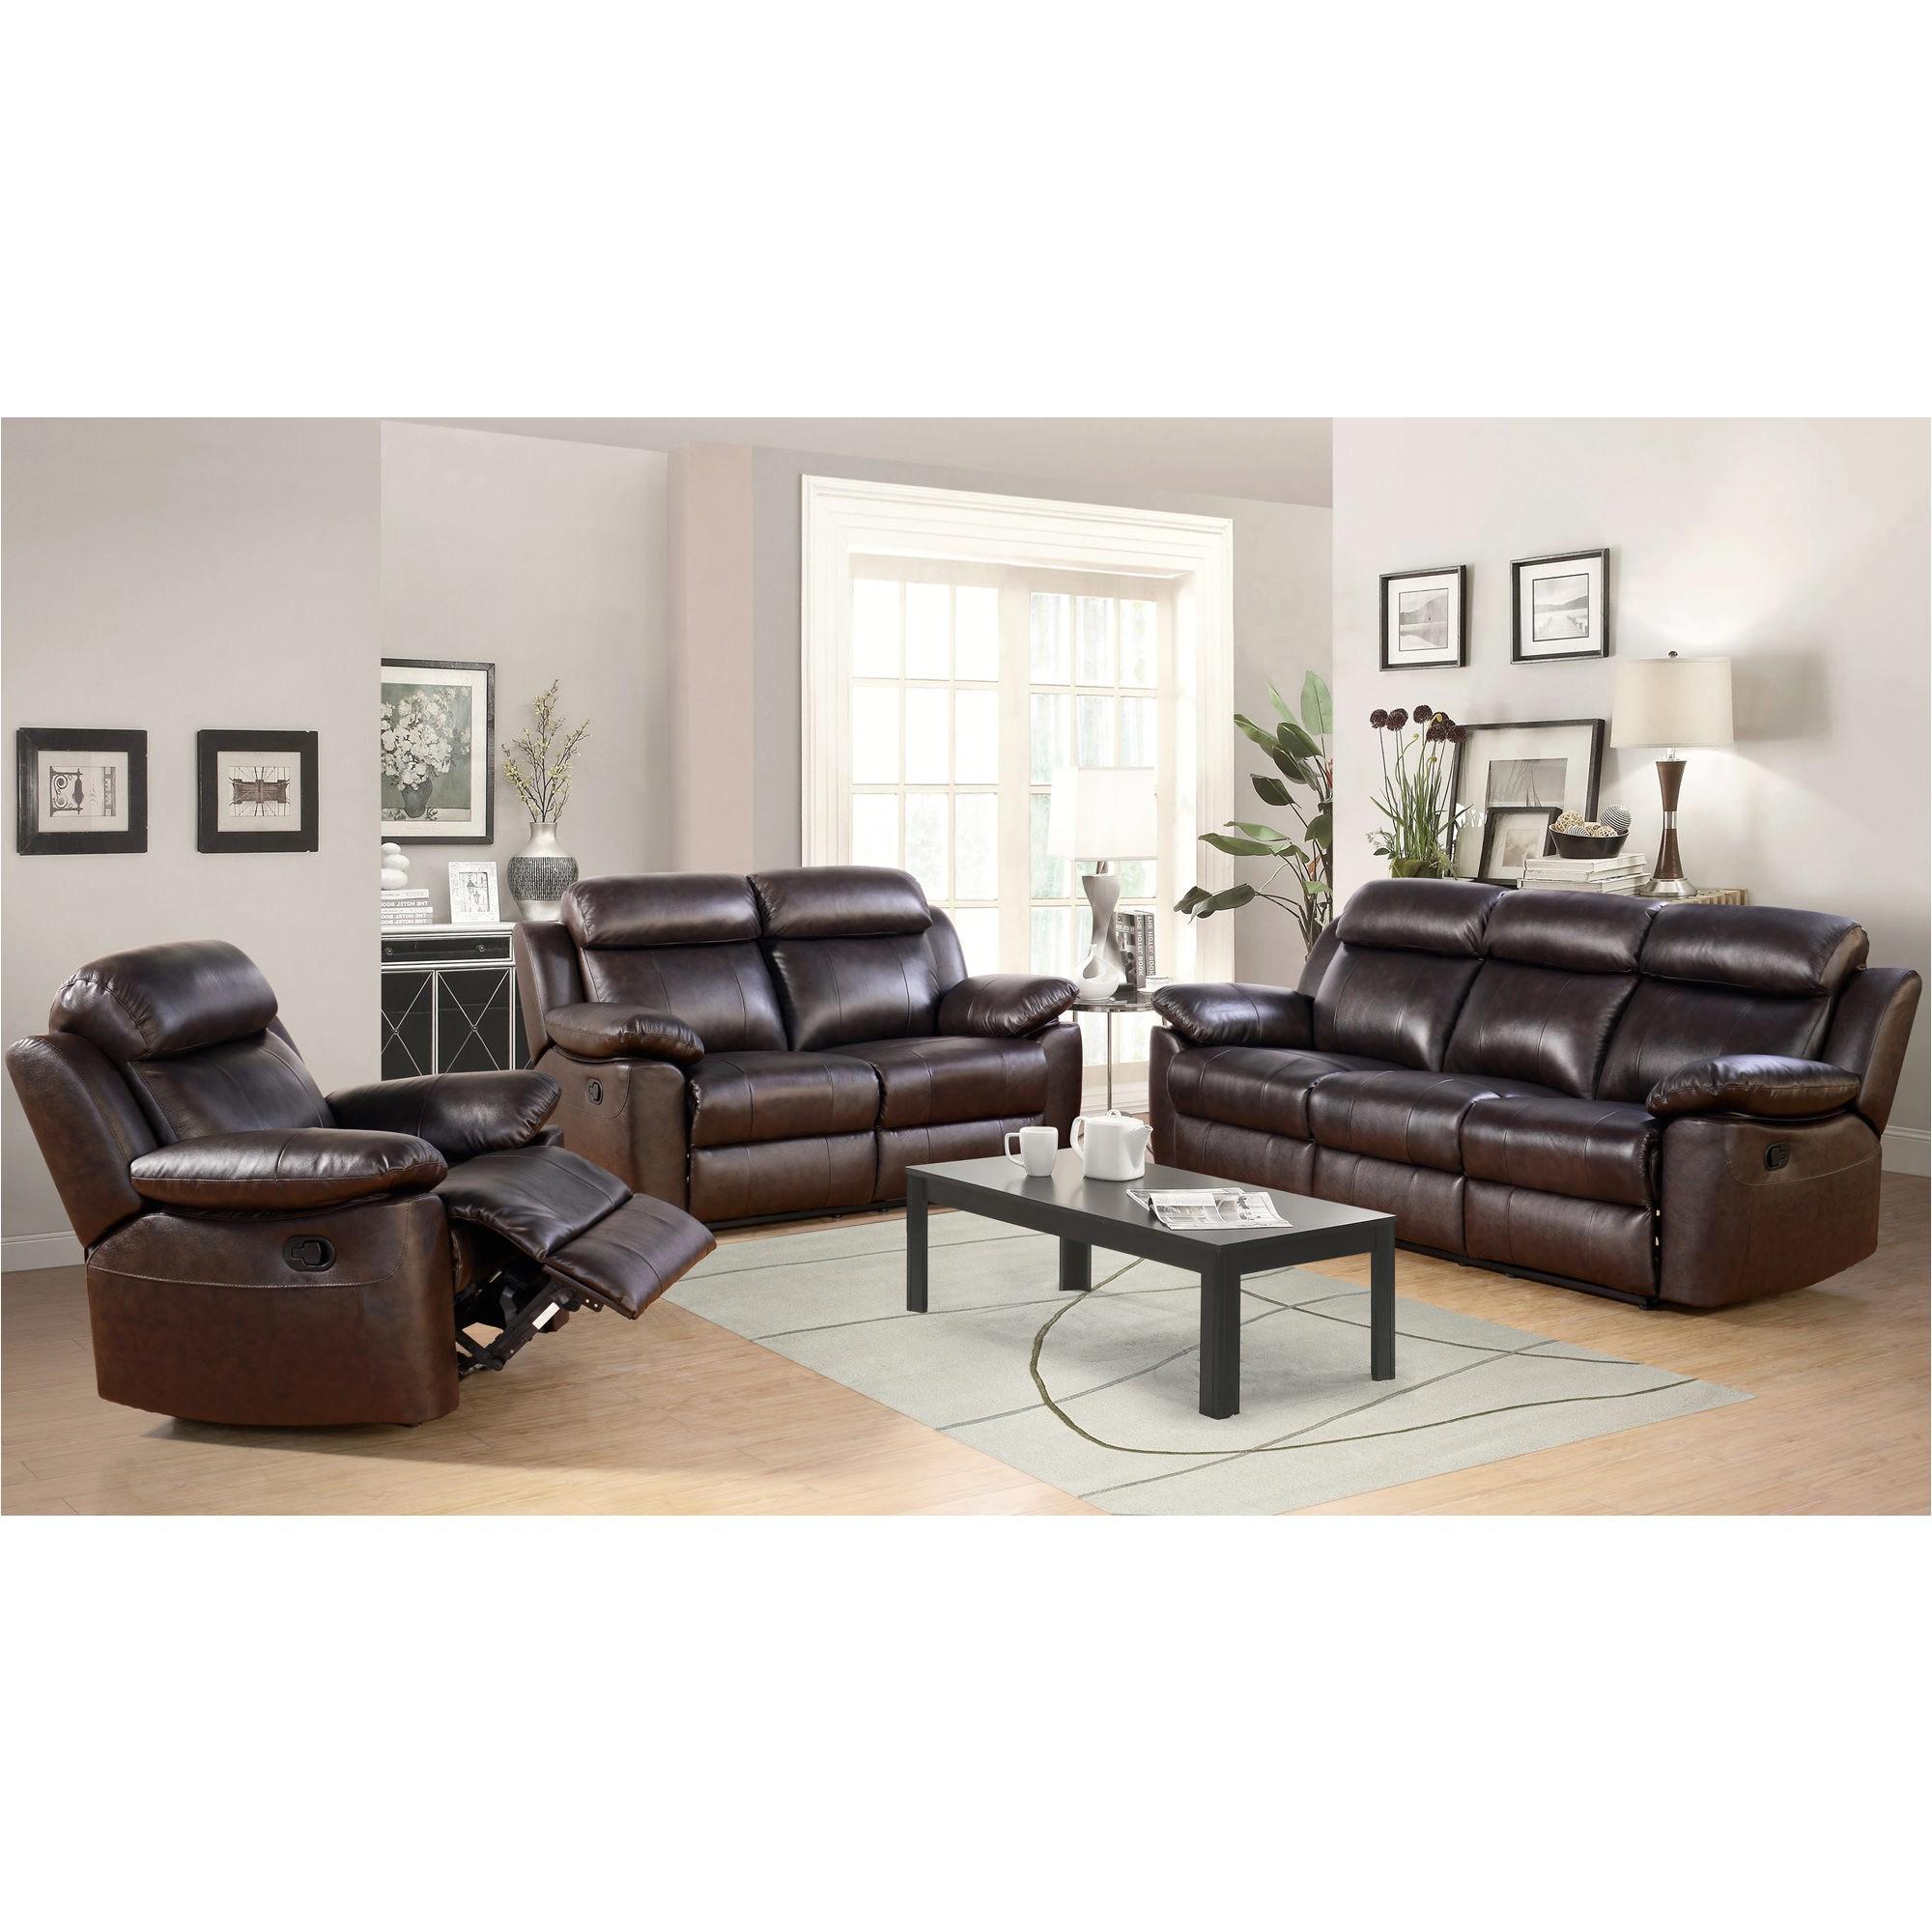 leather 3 piece sofa set new abbyson living braylen 3 pc reclining set brown bjs wholesale